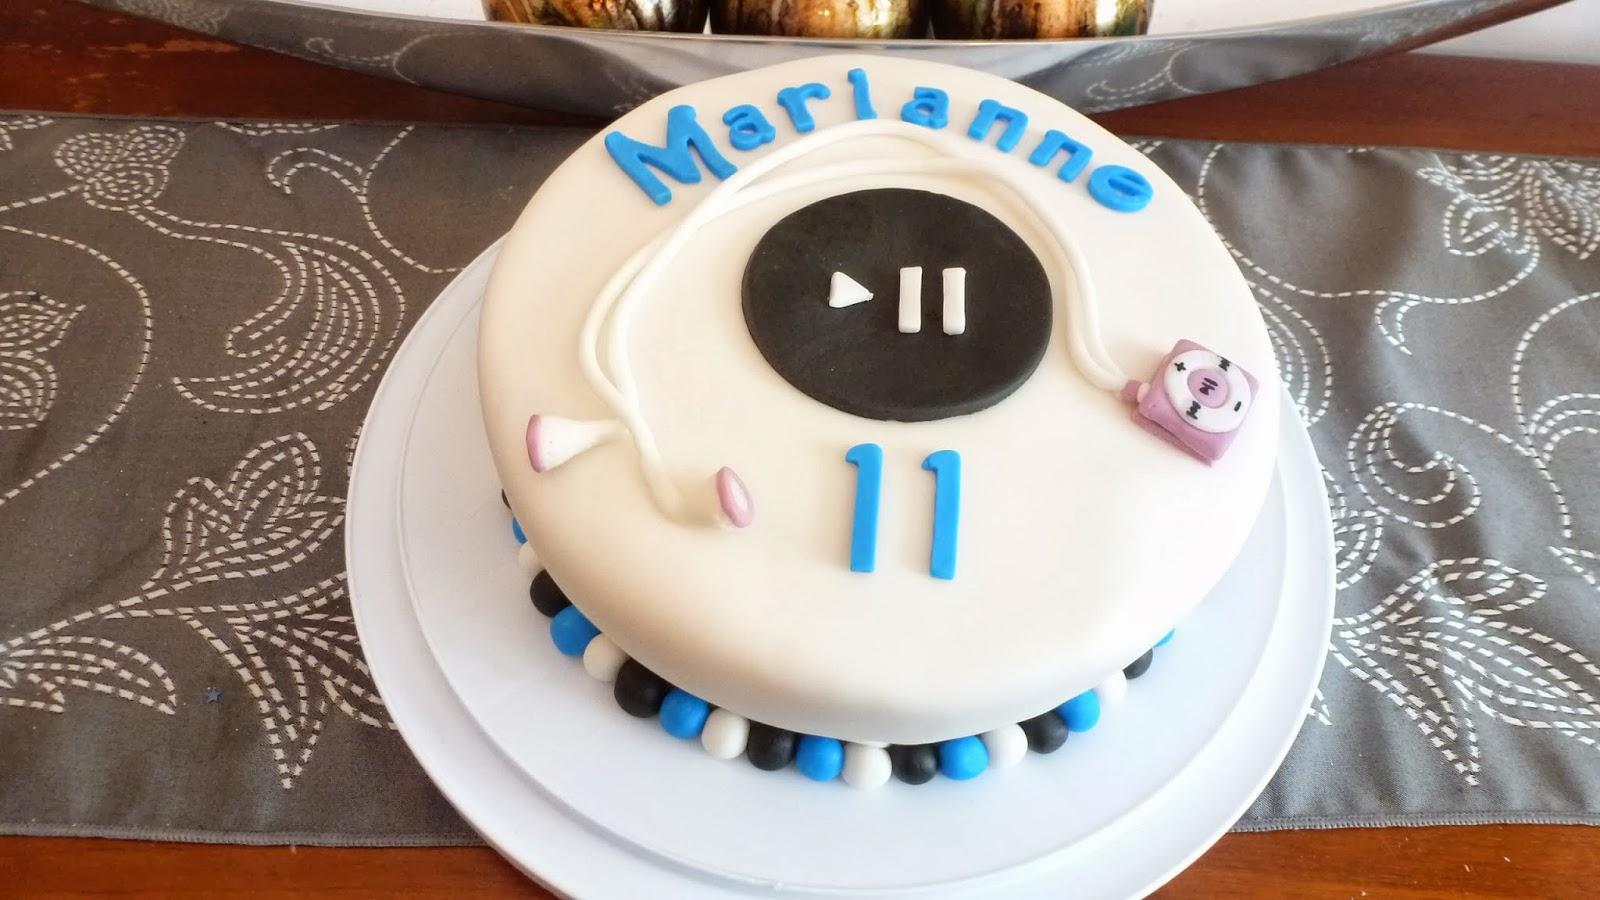 Ipod shuffle Cake (11th birthday)